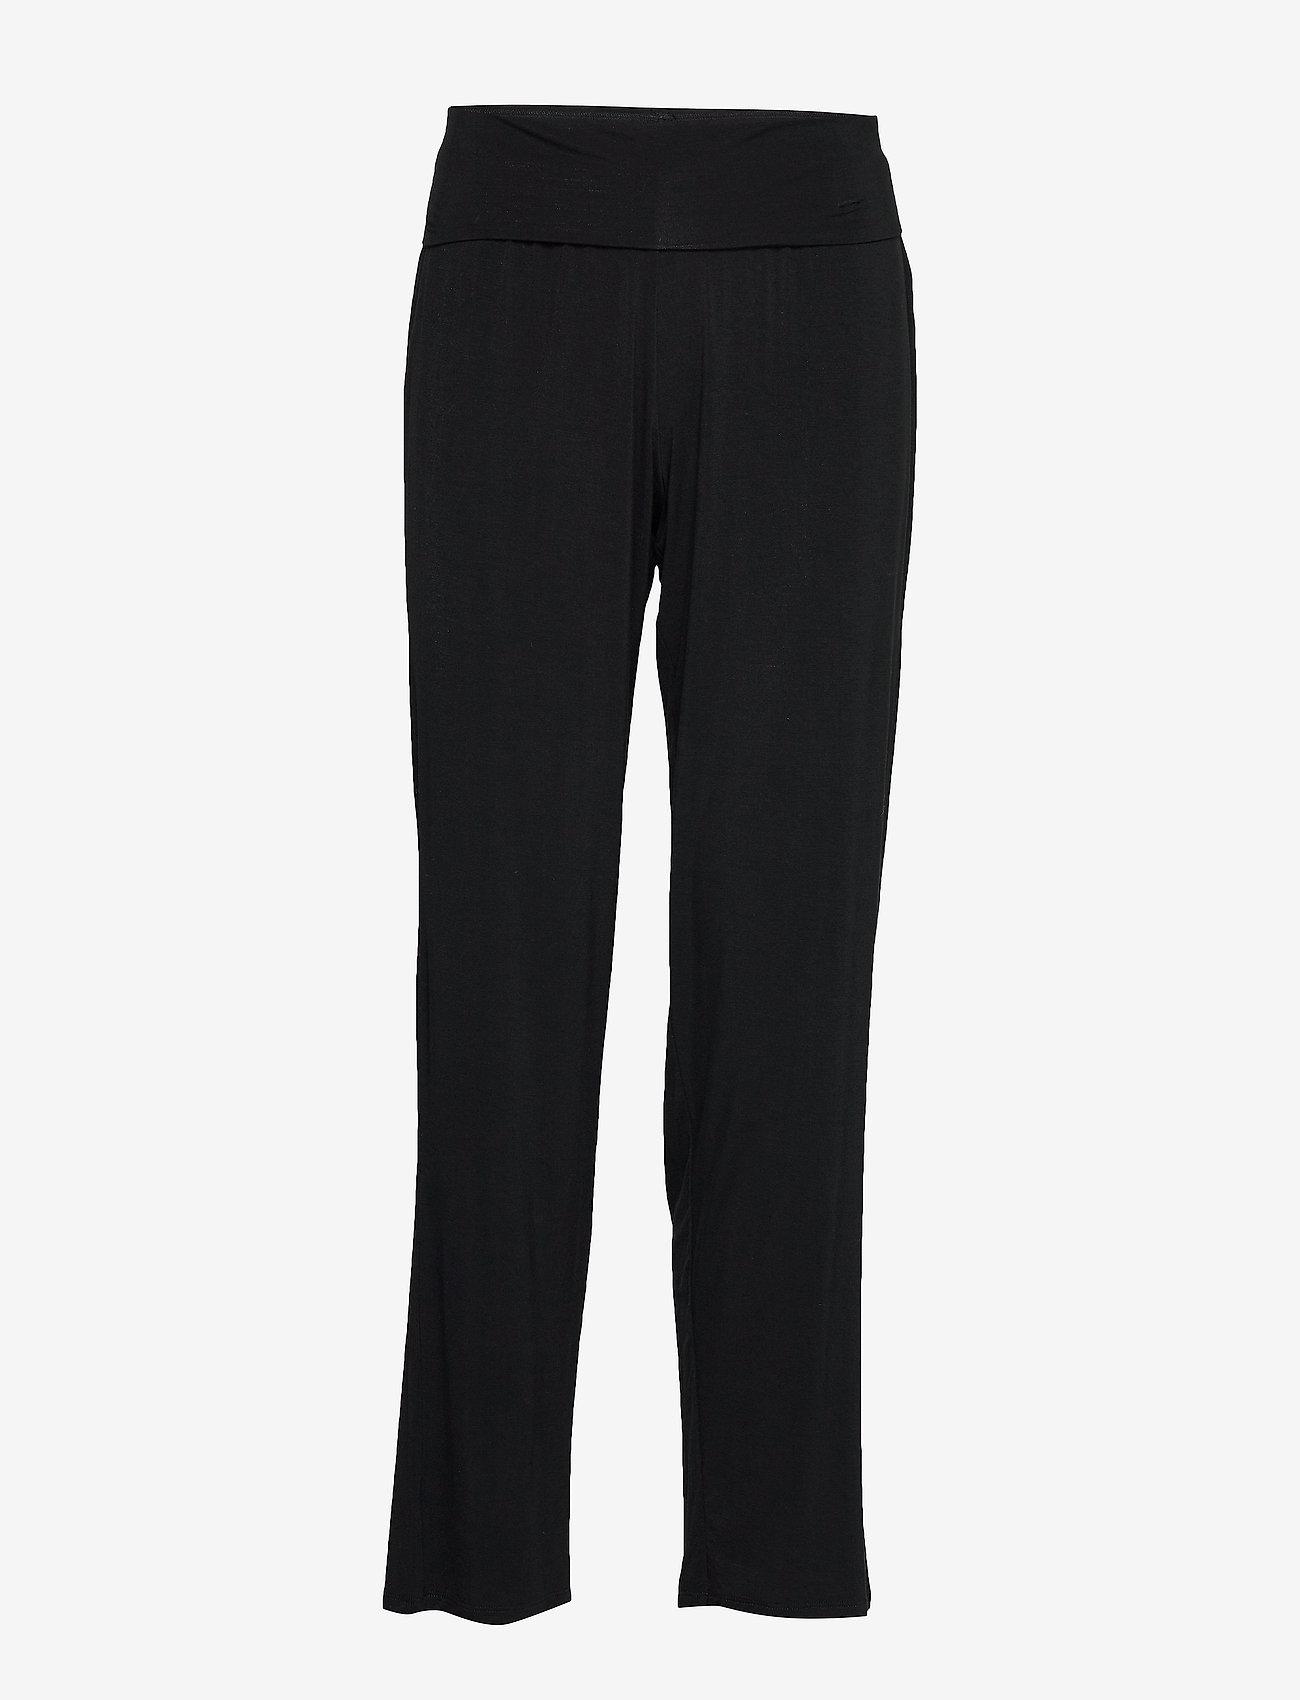 Lady Avenue - Yoga Pants - doły - black - 1